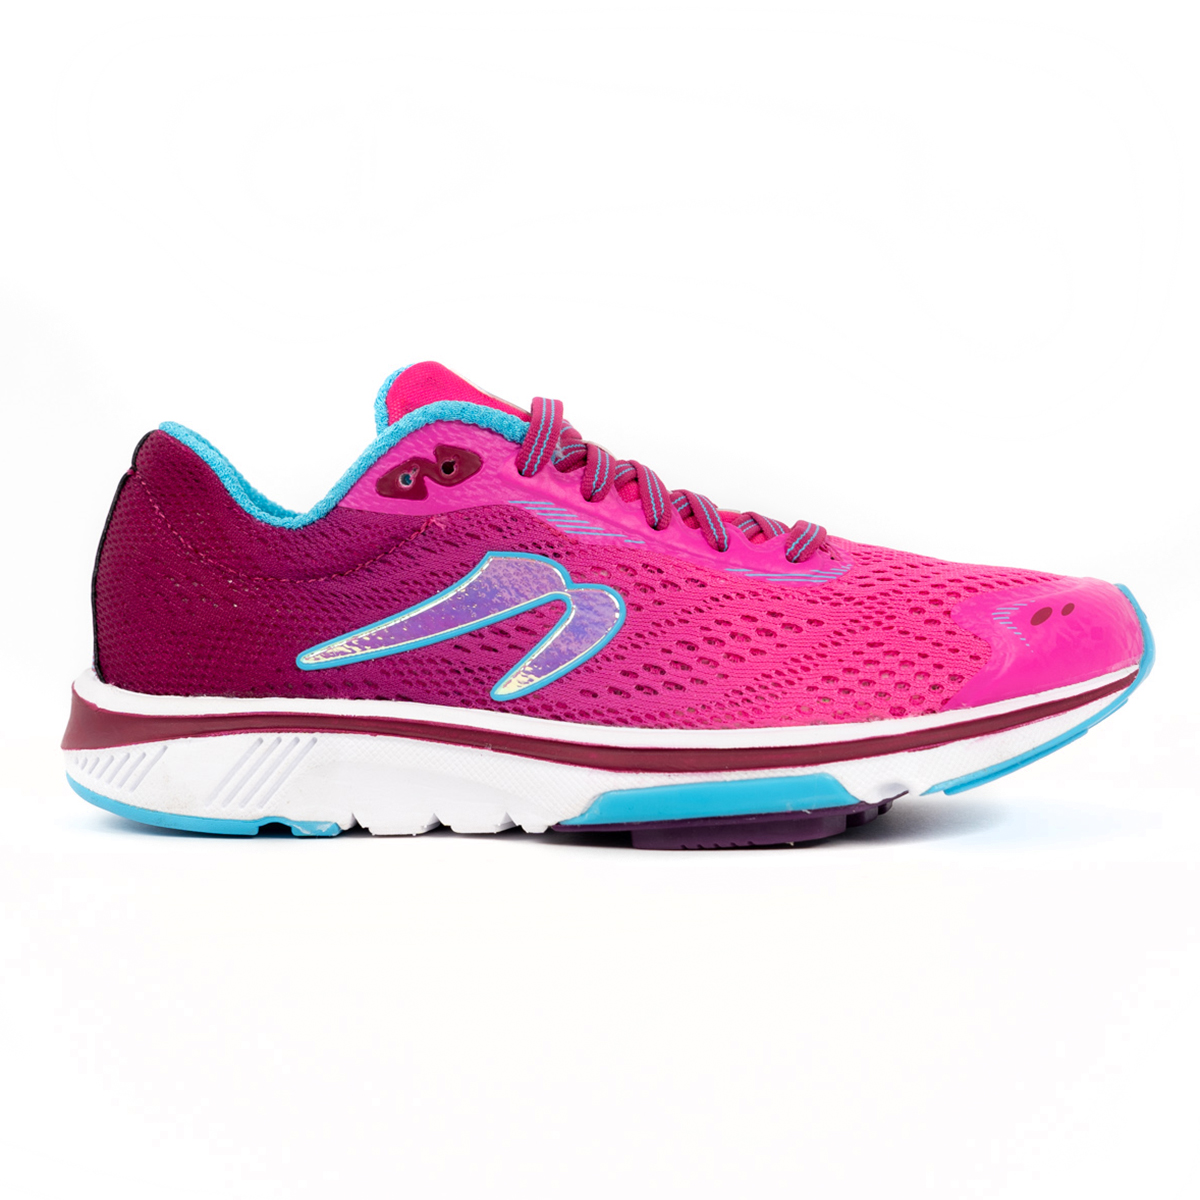 Women's Newton Motion 9 Running Shoe - Color: Pink/Aqua (Regular Width) - Size: 5, Pink/Aqua, large, image 1